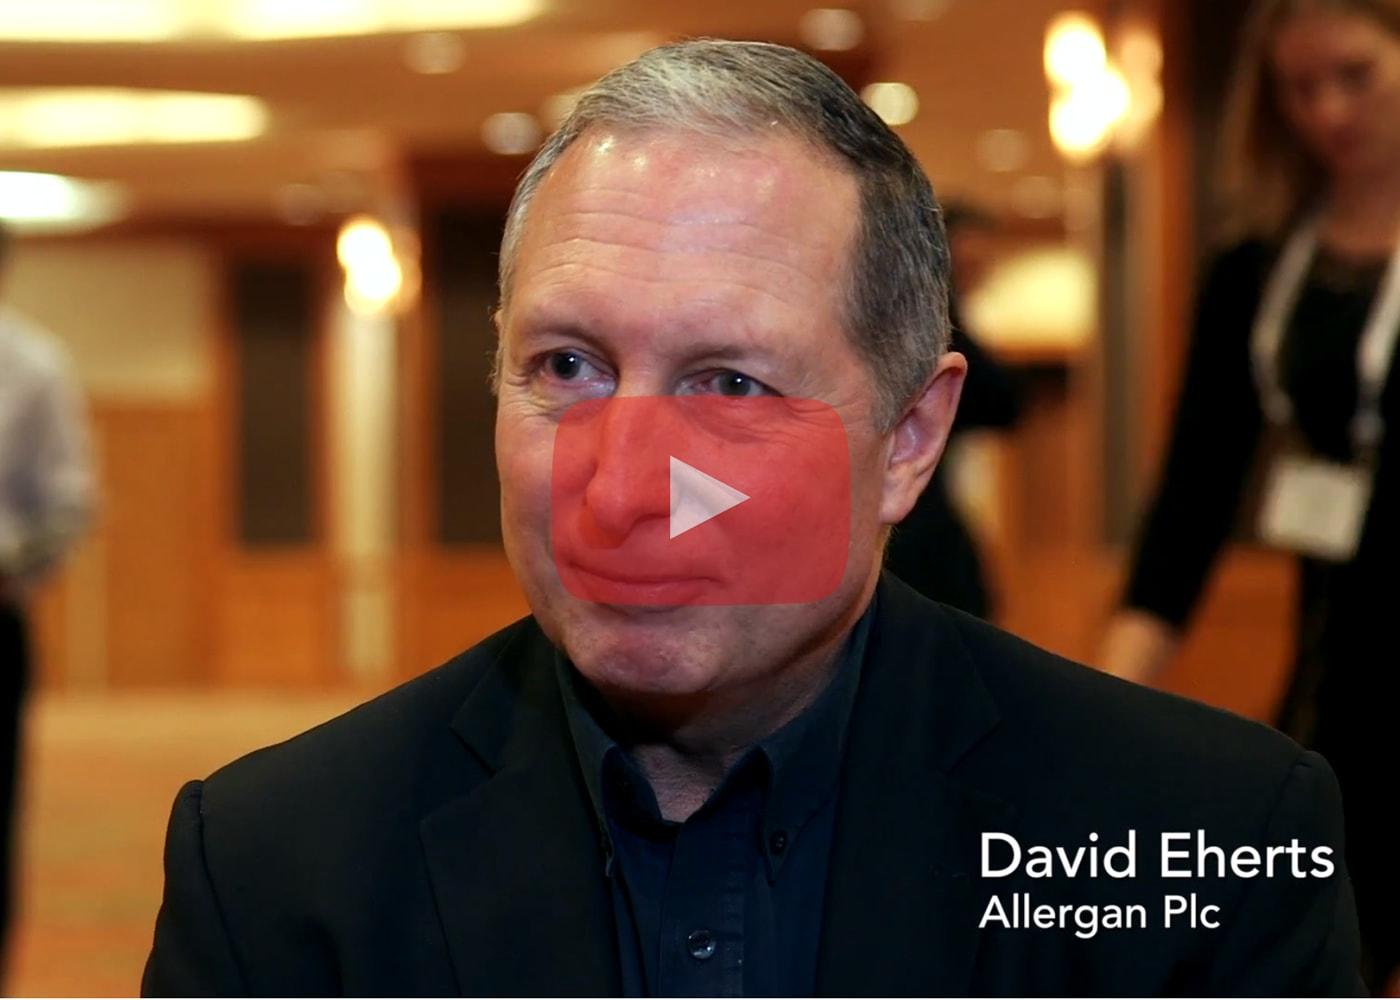 naem-2018-blog-dave-eherts-allergan-obersvations-700x500